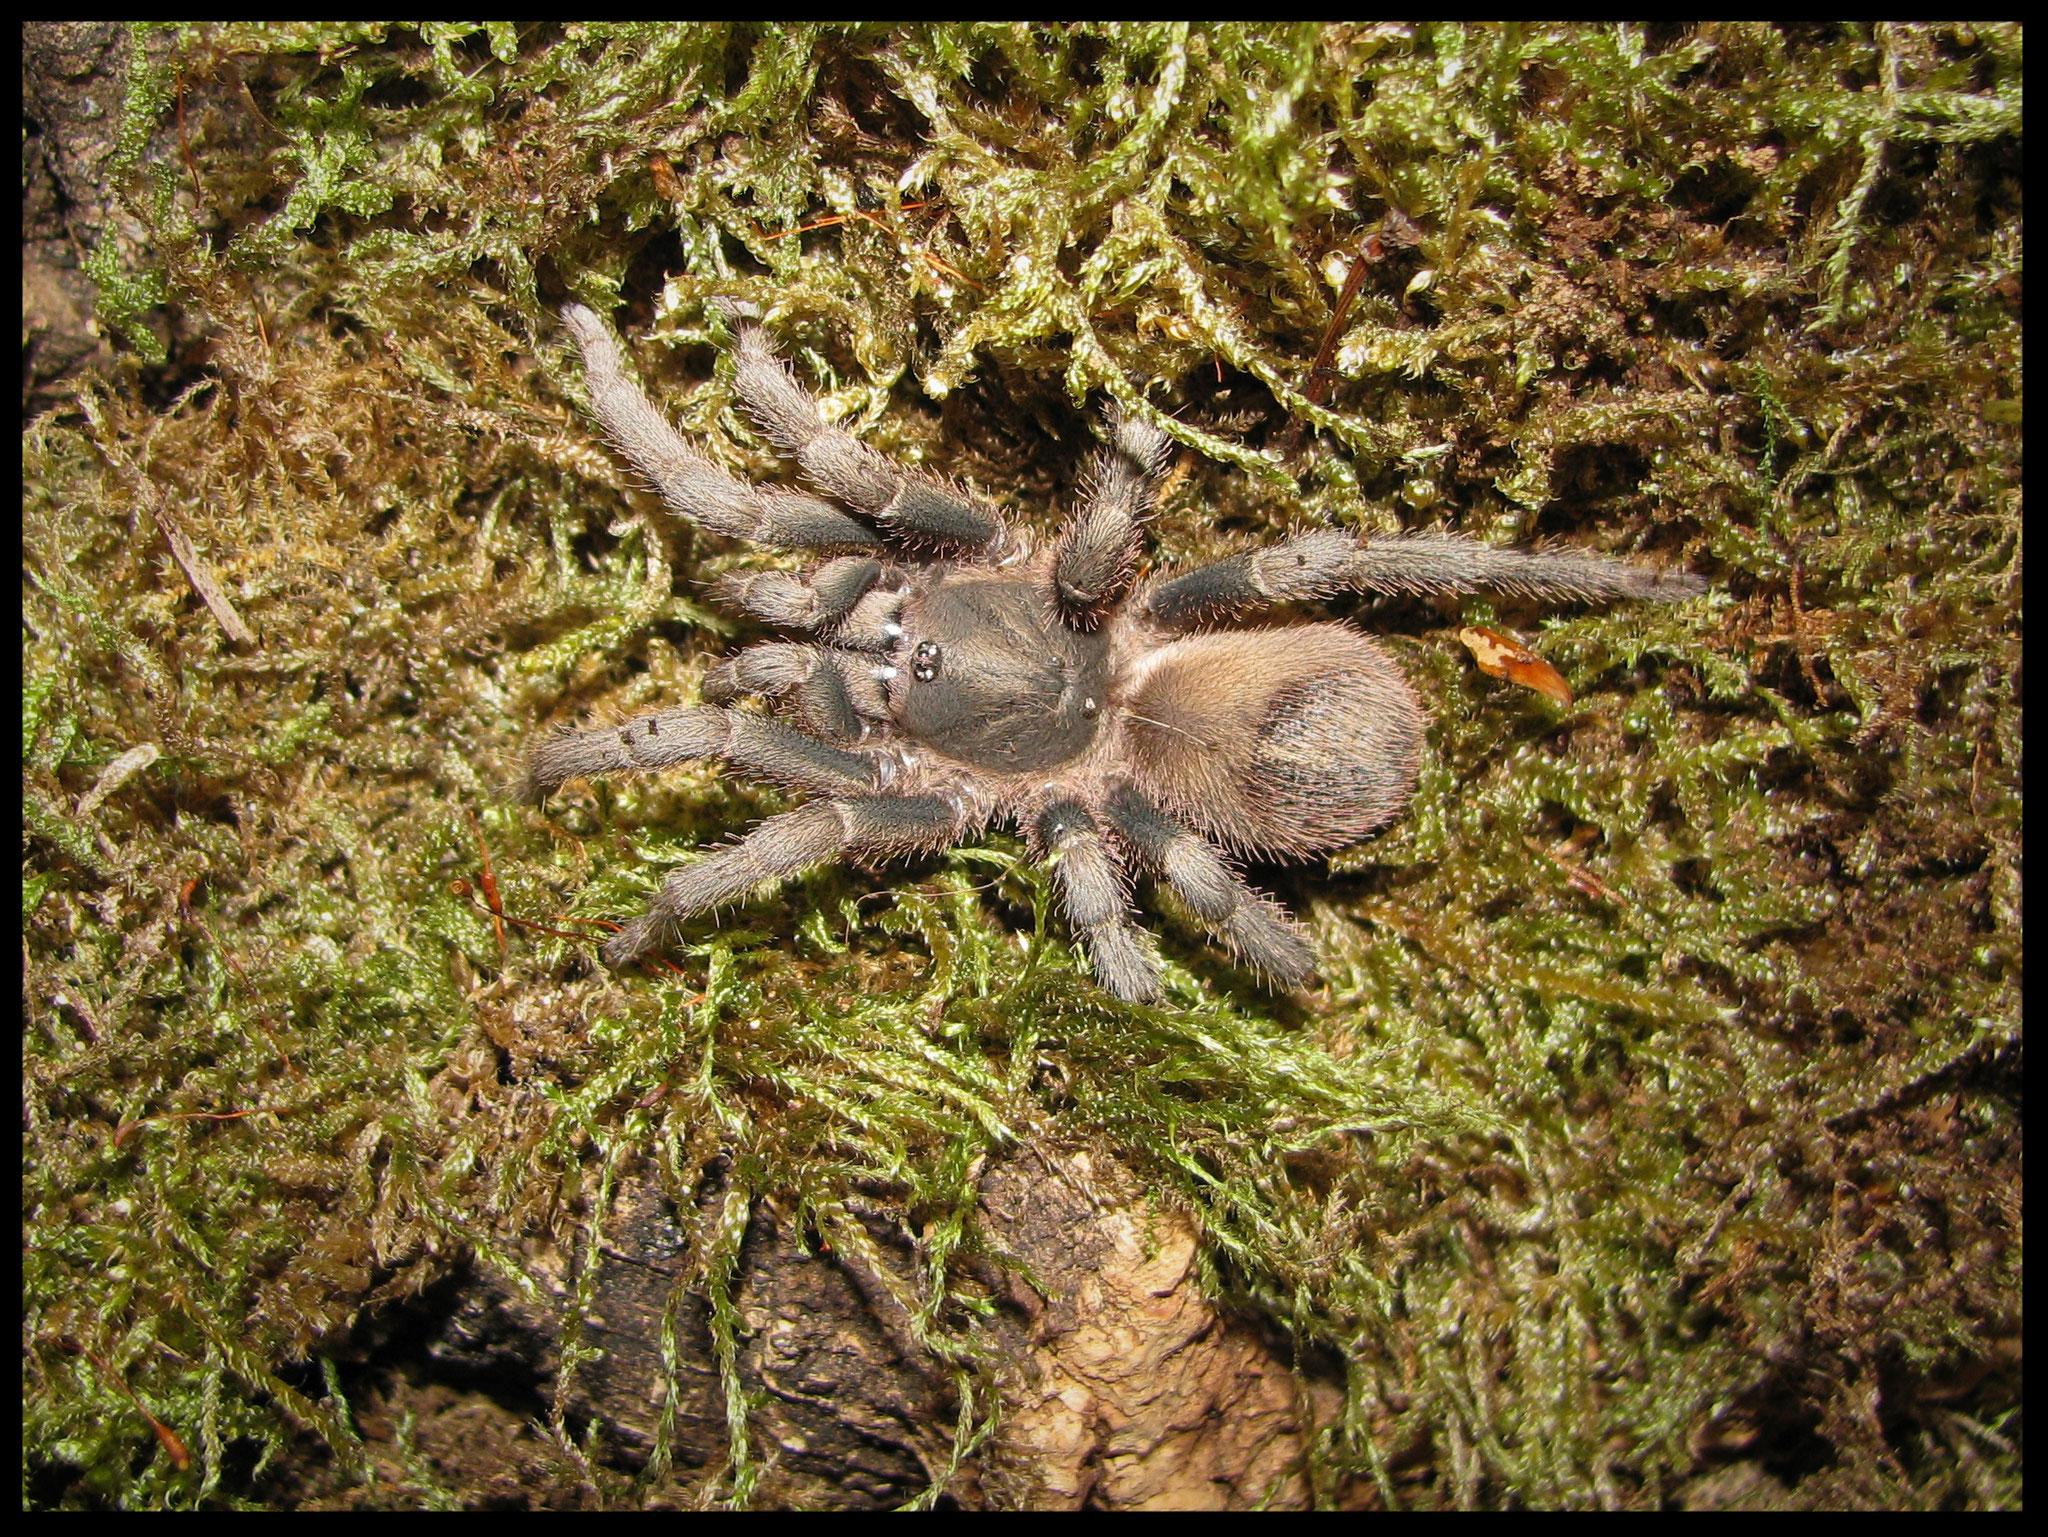 0.1 Theraphosinae sp. Villa Tunari